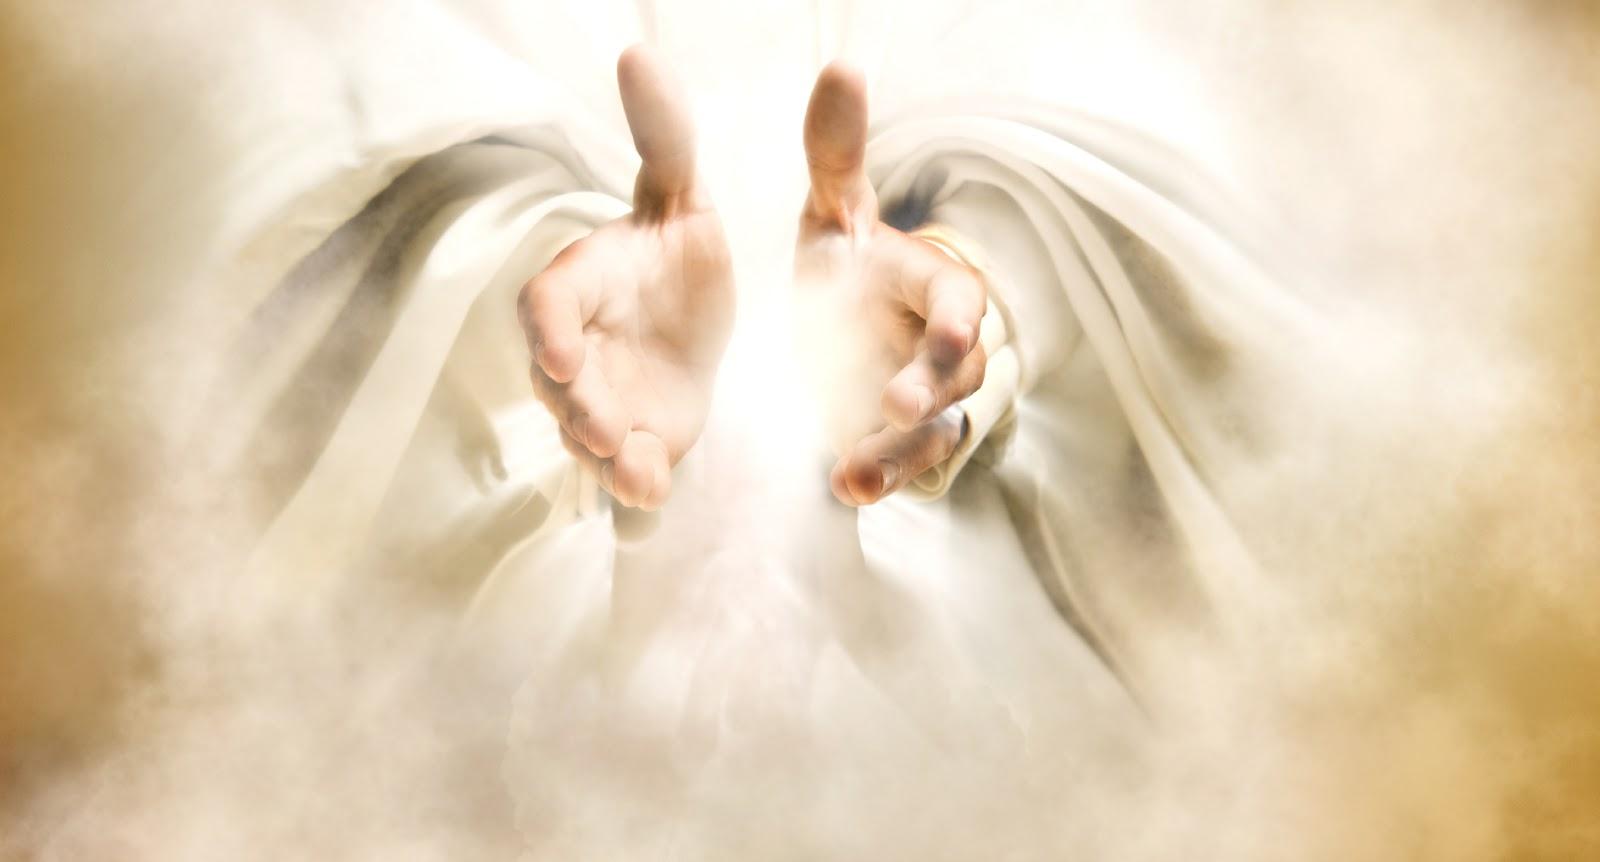 Kristove ruke